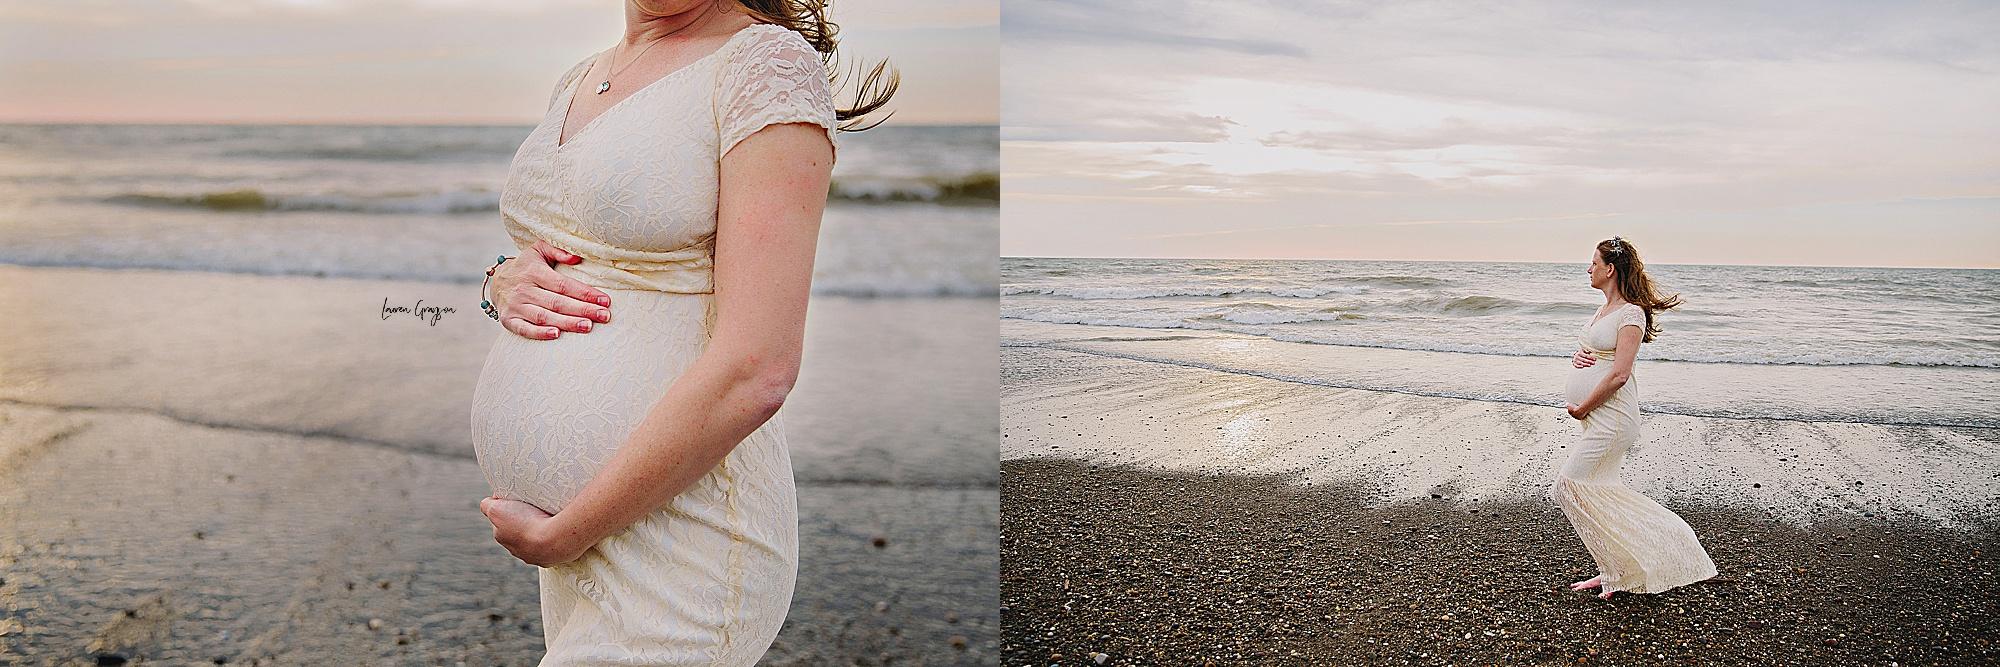 lauren-grayson-photography-mentor-headlands-park-cleveland-ohio-photographer-tiffany-maternity-_0010.jpg